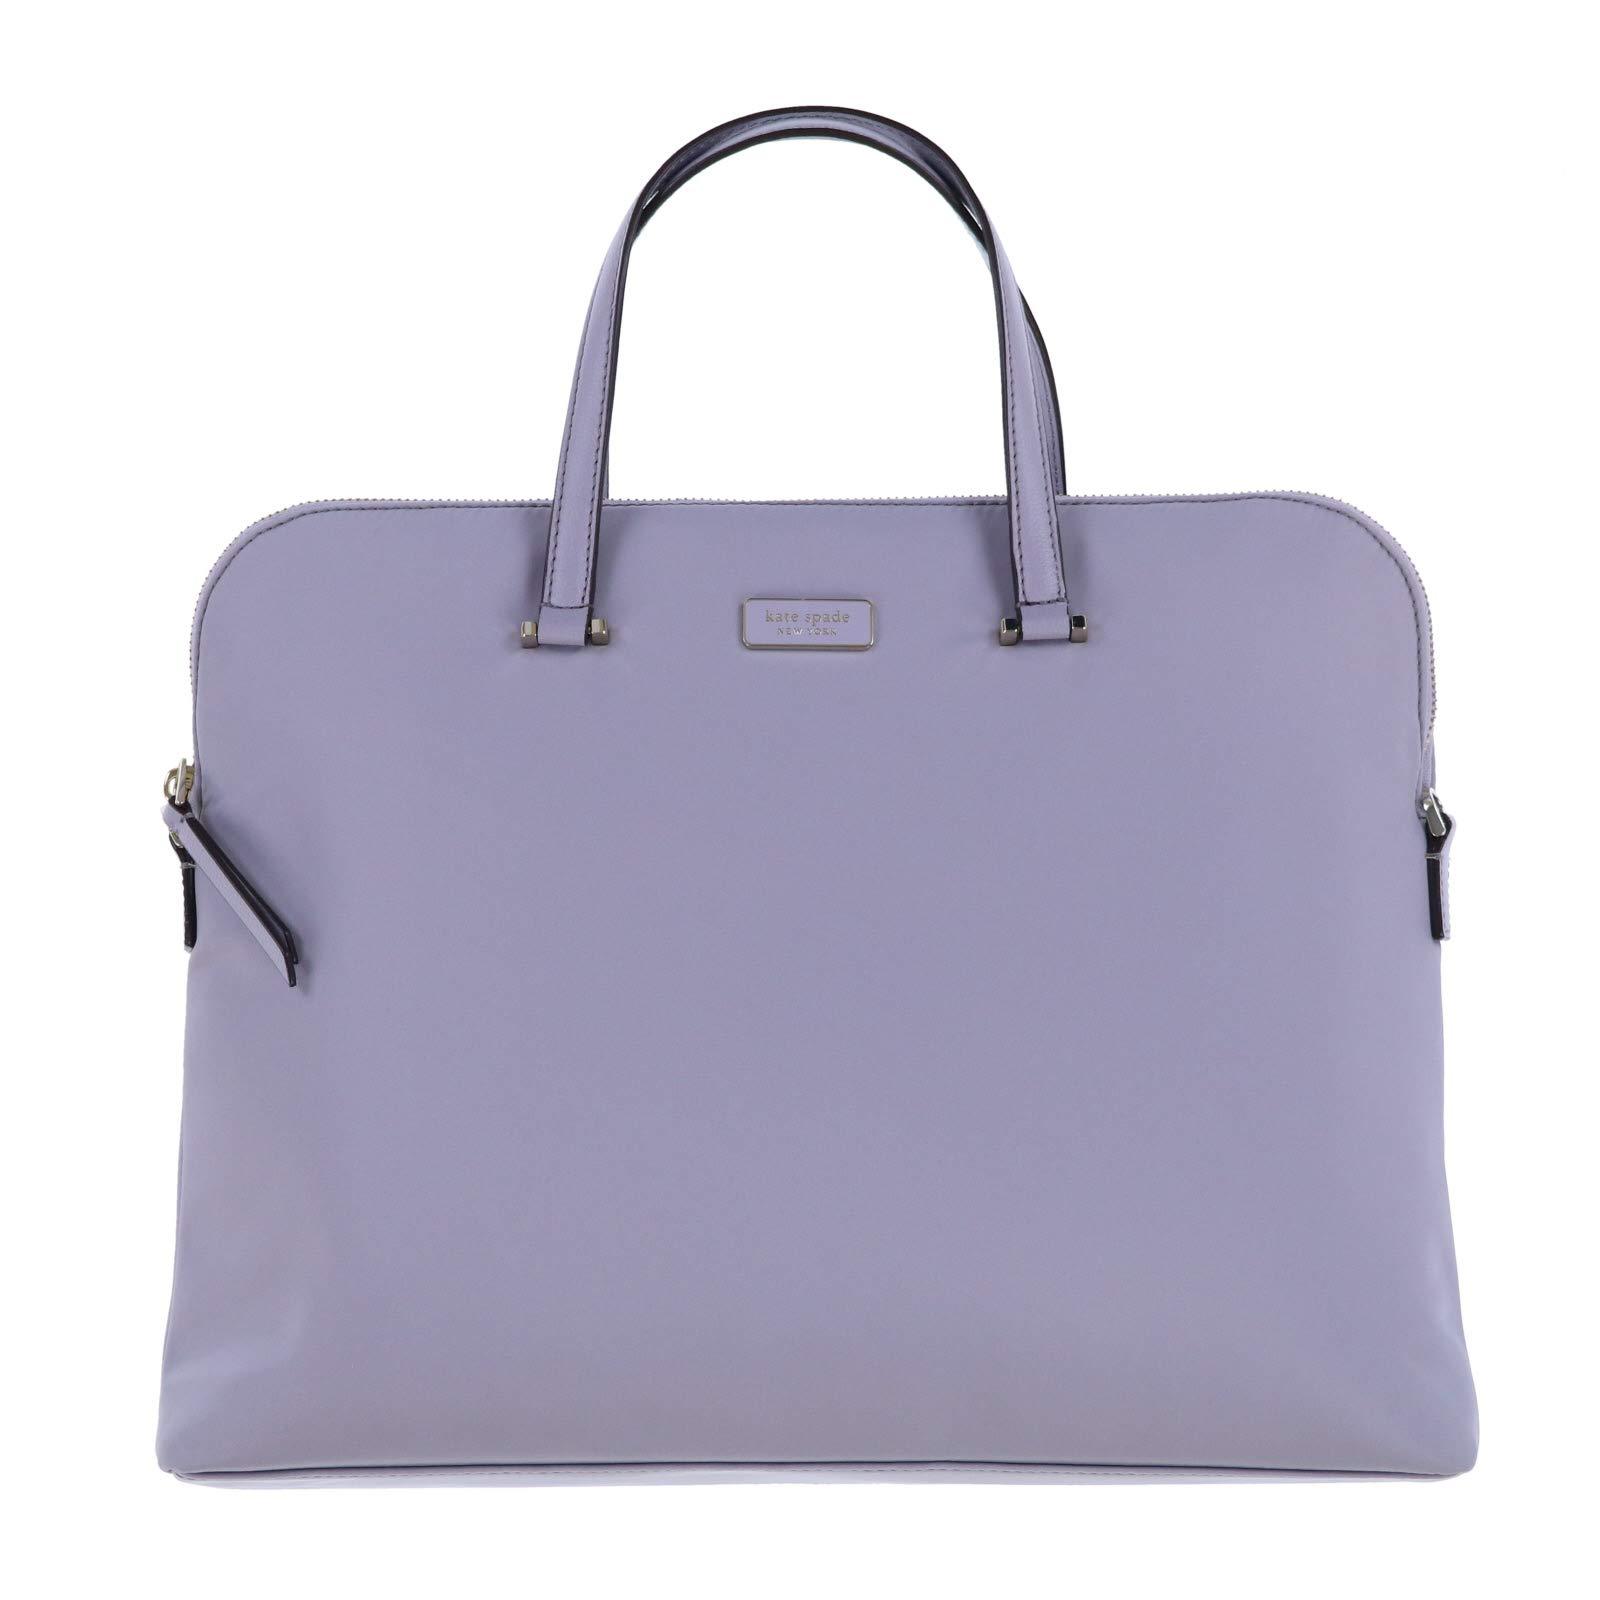 Kate Spade New York Tote Dawn Laptop Bag (Icy Lavender)